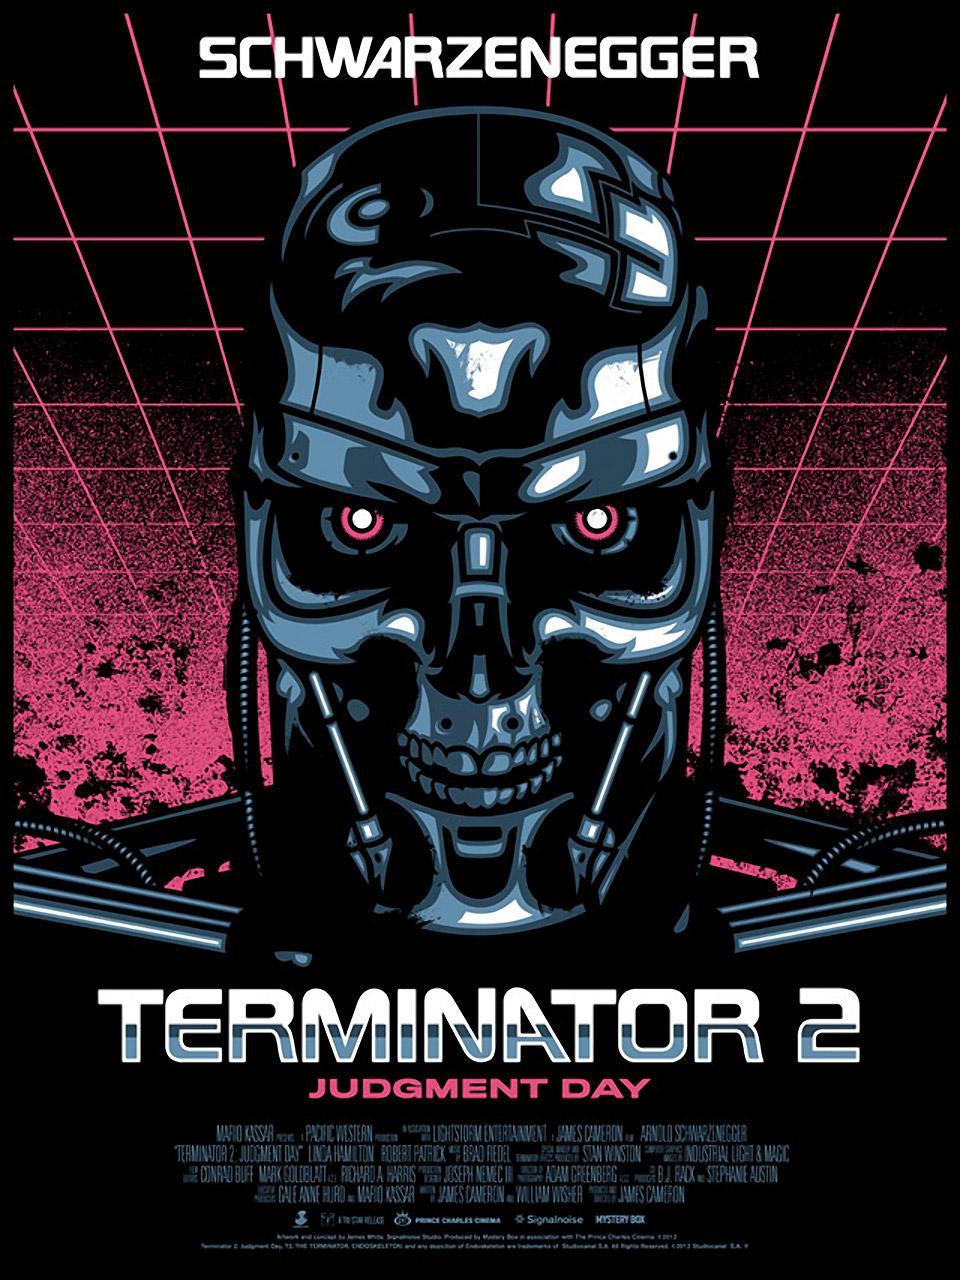 Intimidating Terminator 2: Judgment Day Prints